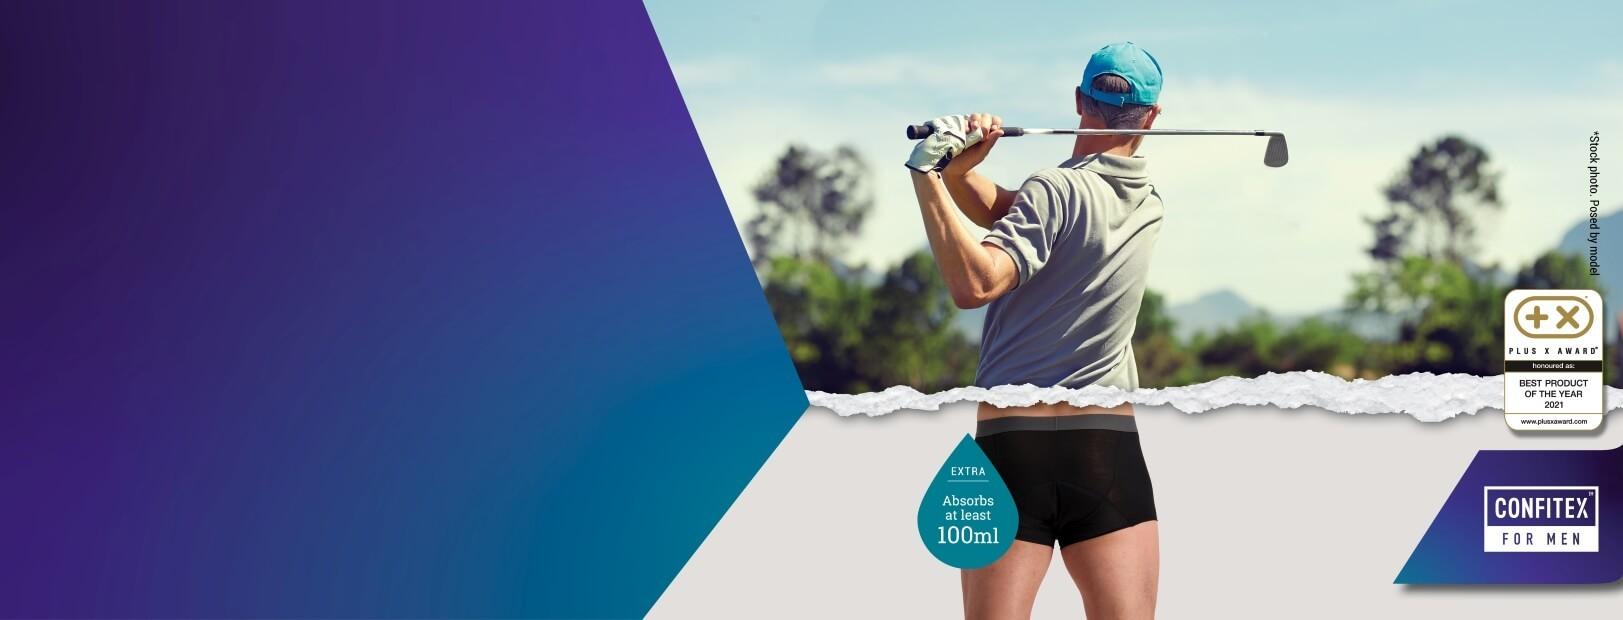 A golfer wearing Confitex for Men Extra absorbent underwear